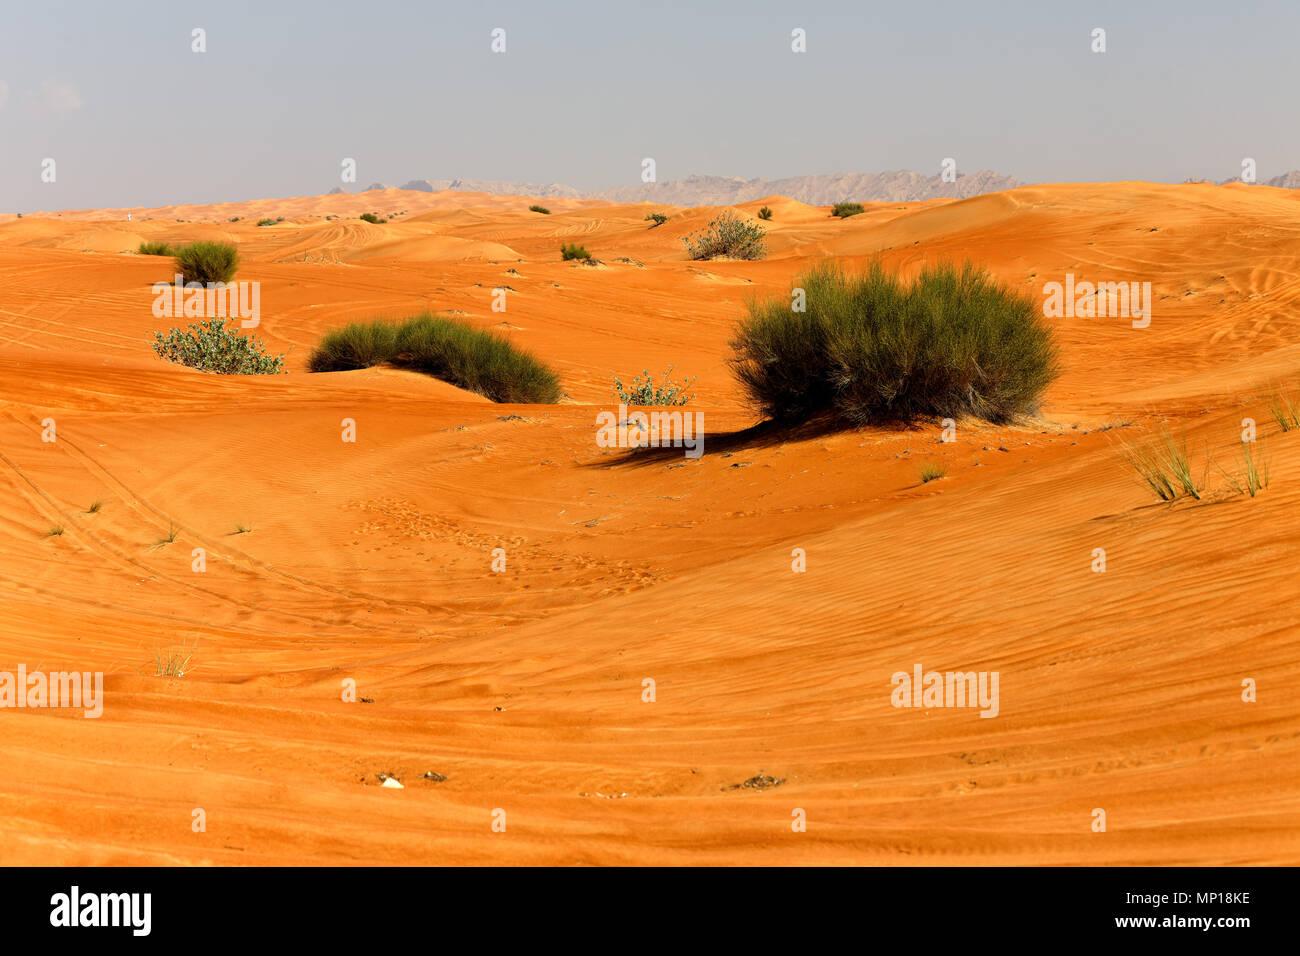 Dubai. Stock Photo